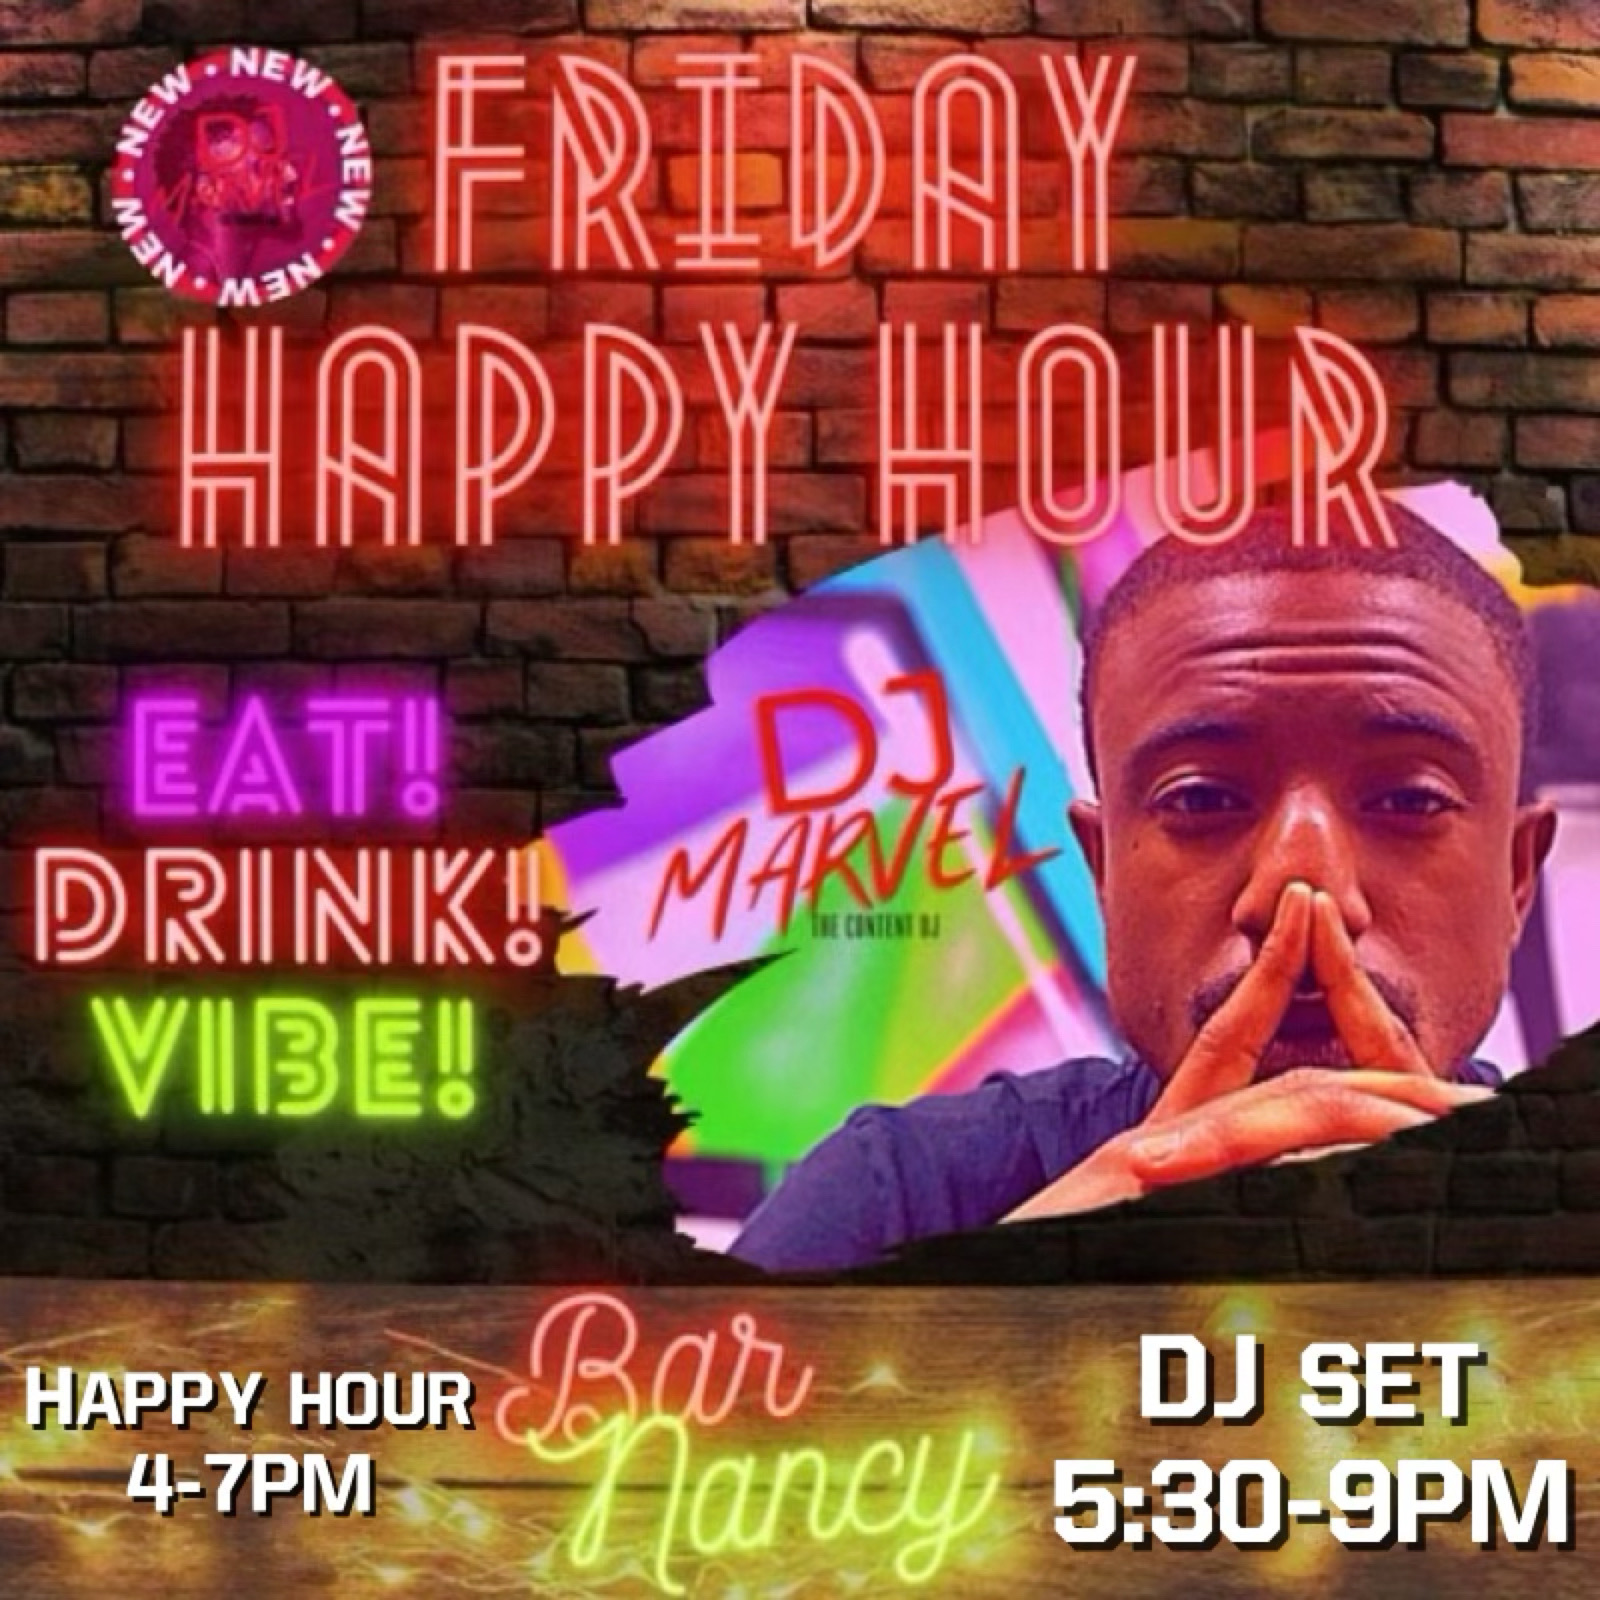 FRIDAY HAPPY HOUR AT BAR NANCY 4-7PM / DJ MARVEL 5:30 - 9PM